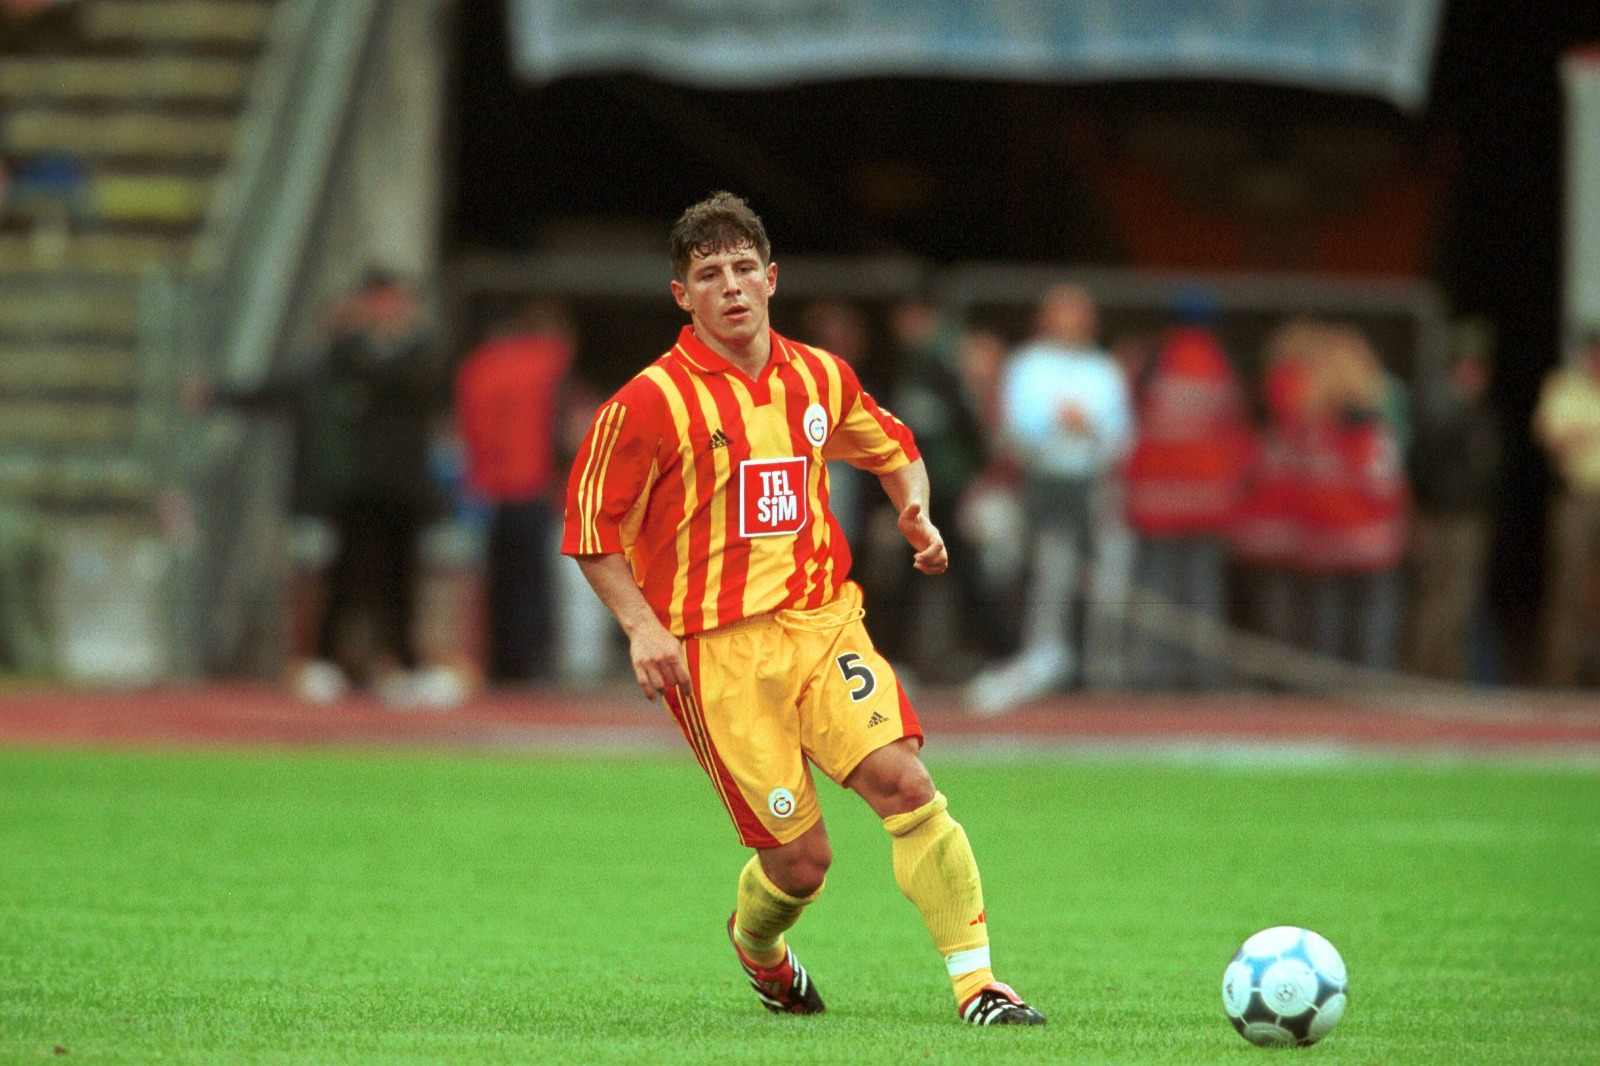 Emre Galatasaray